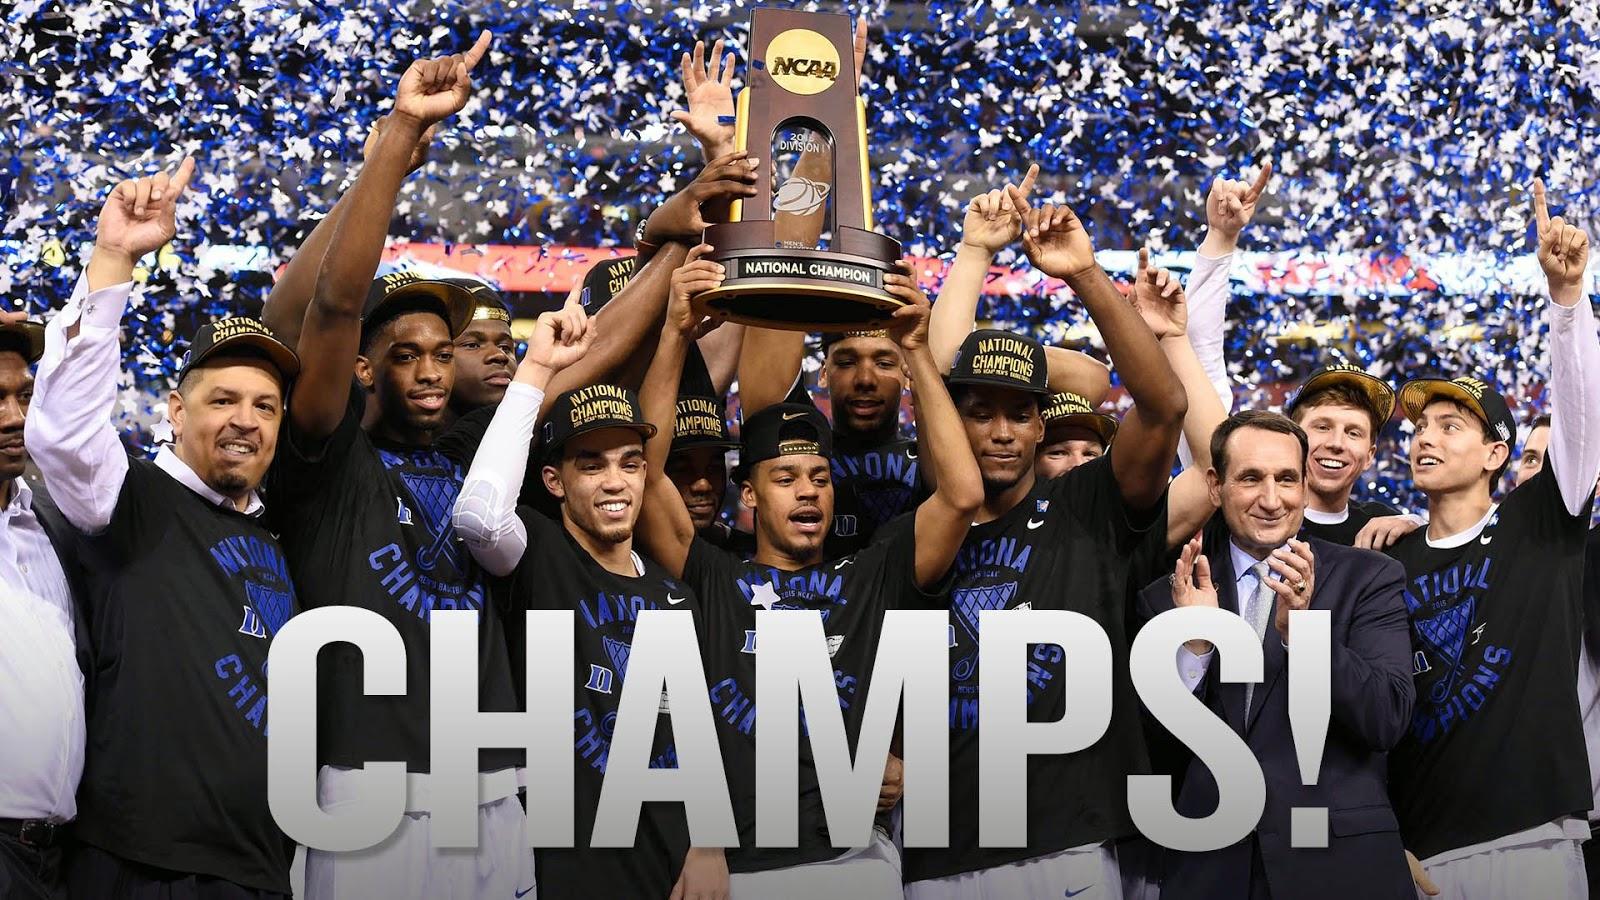 Duke Basketball 2015 Championship Wallpaper - WallpaperSafari